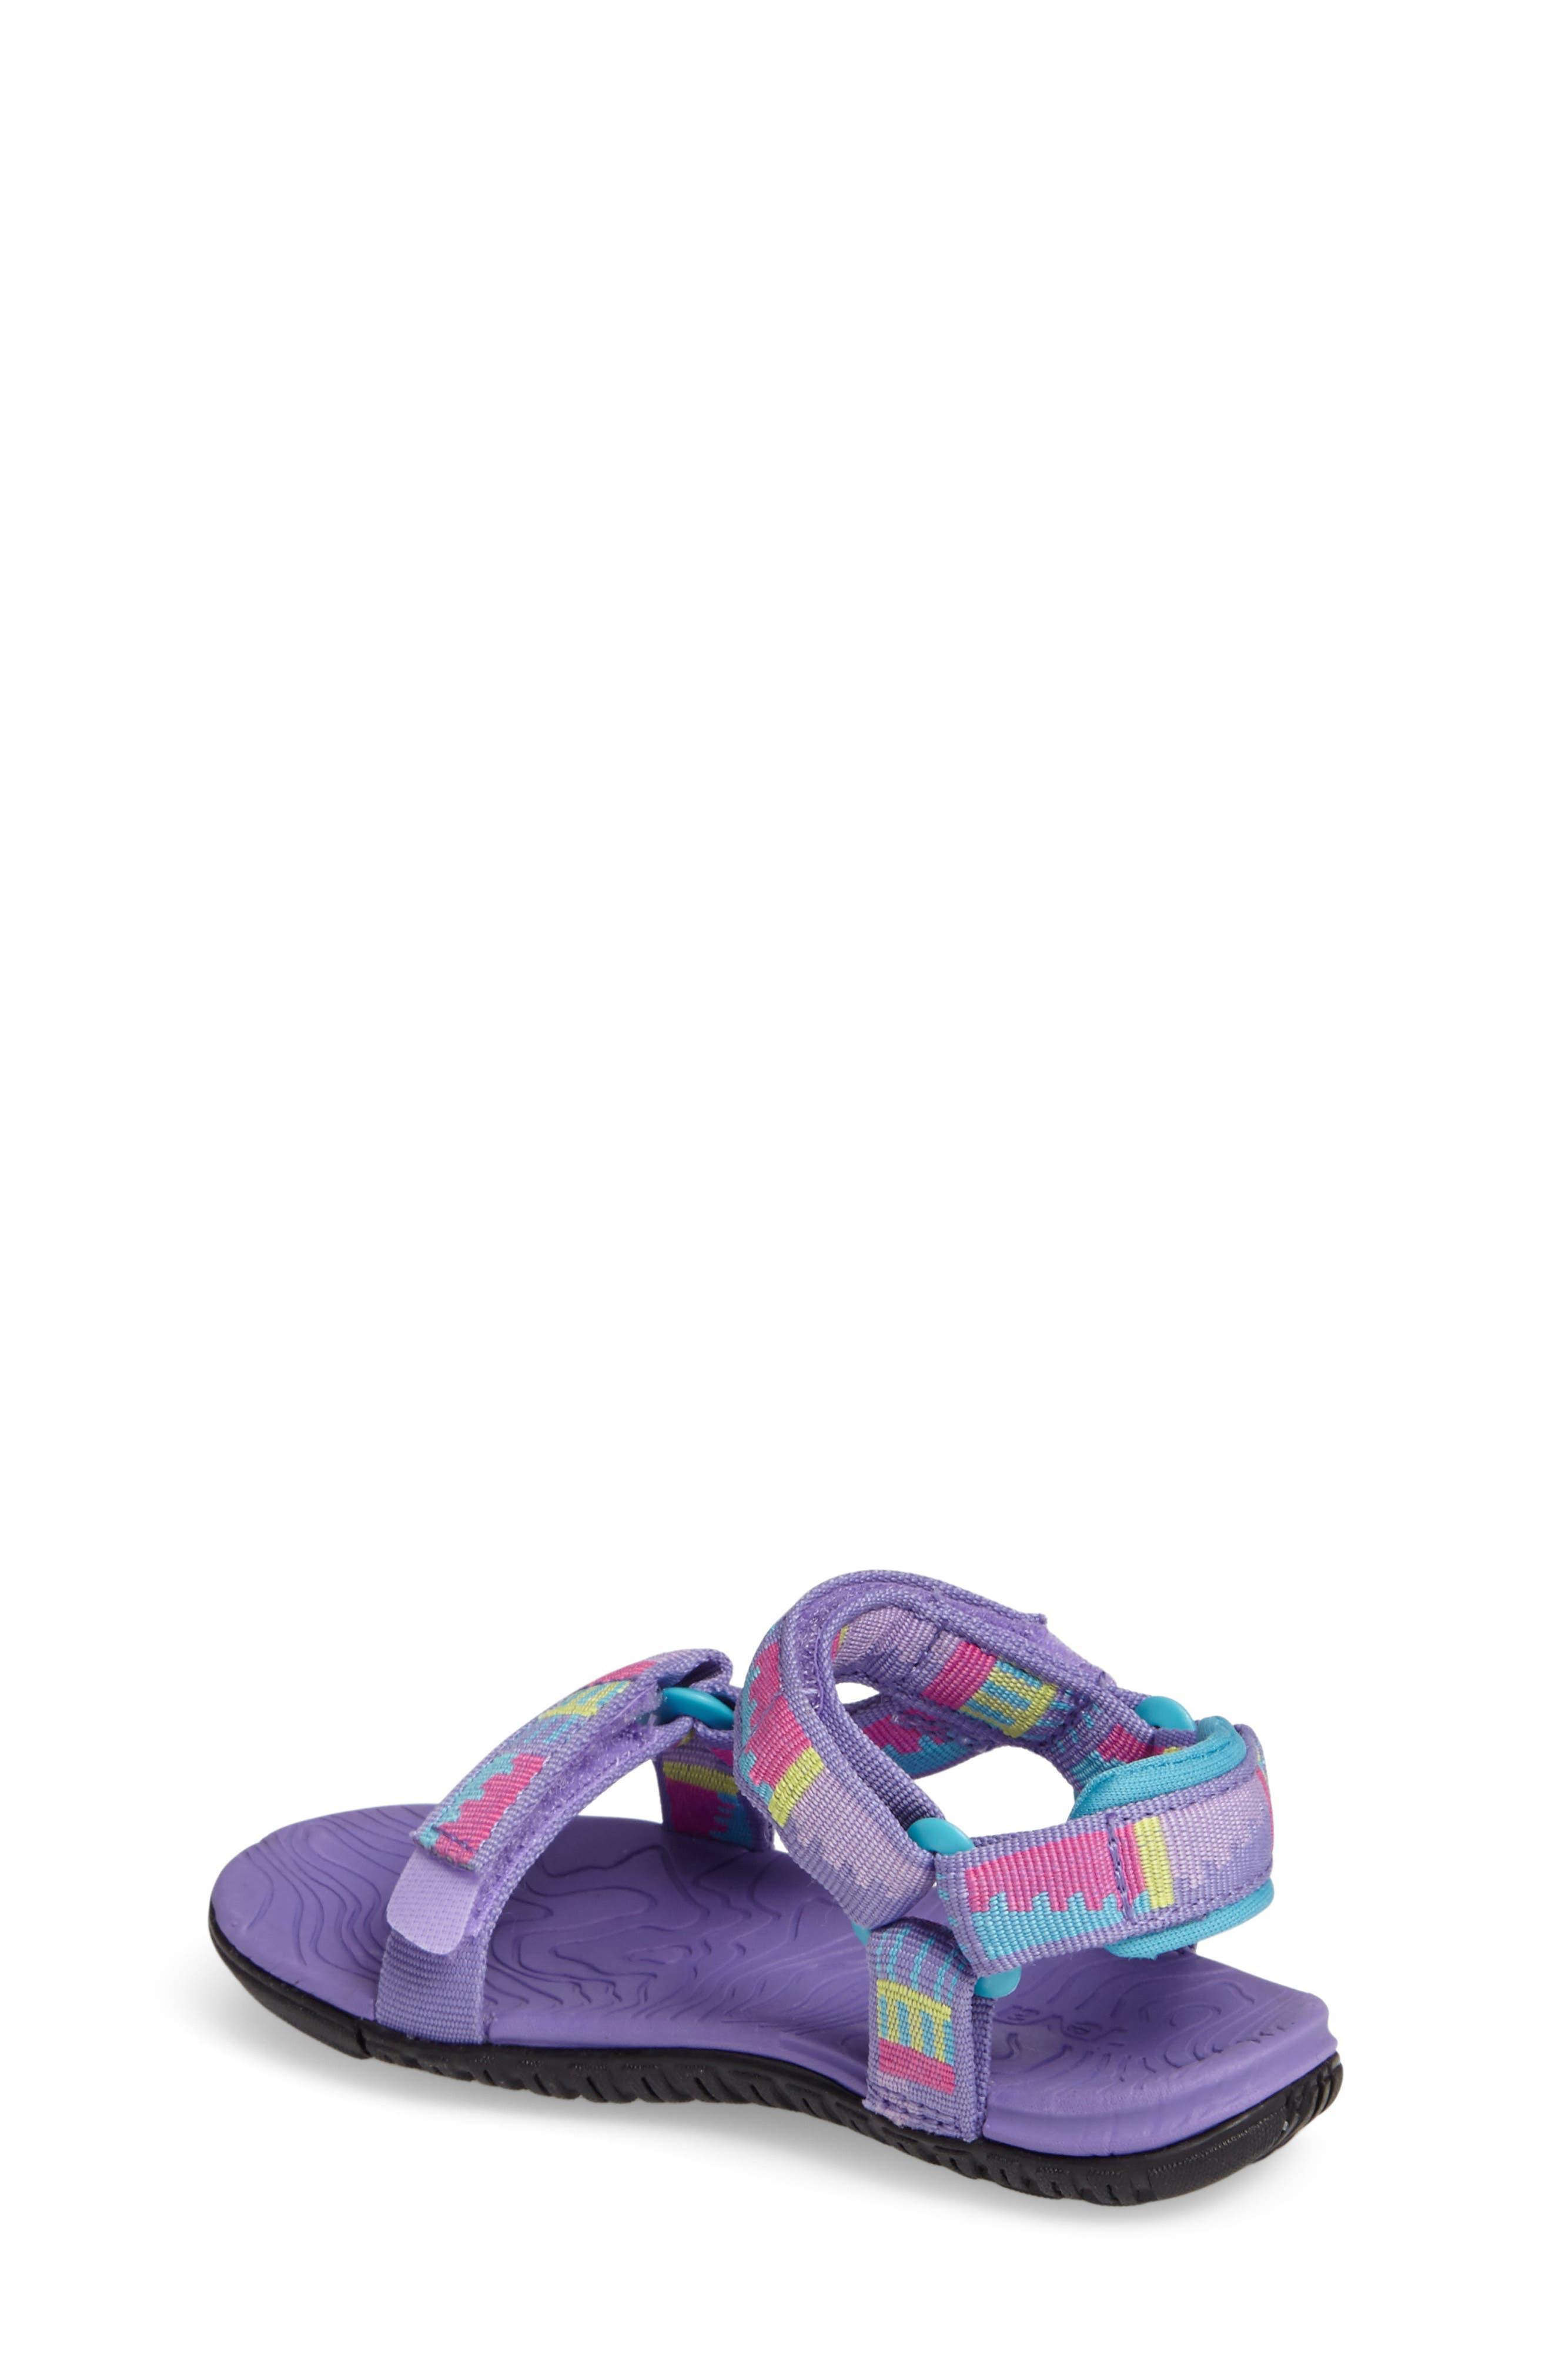 'Hurricane 3' Sport Sandal,                             Alternate thumbnail 2, color,                             Purple